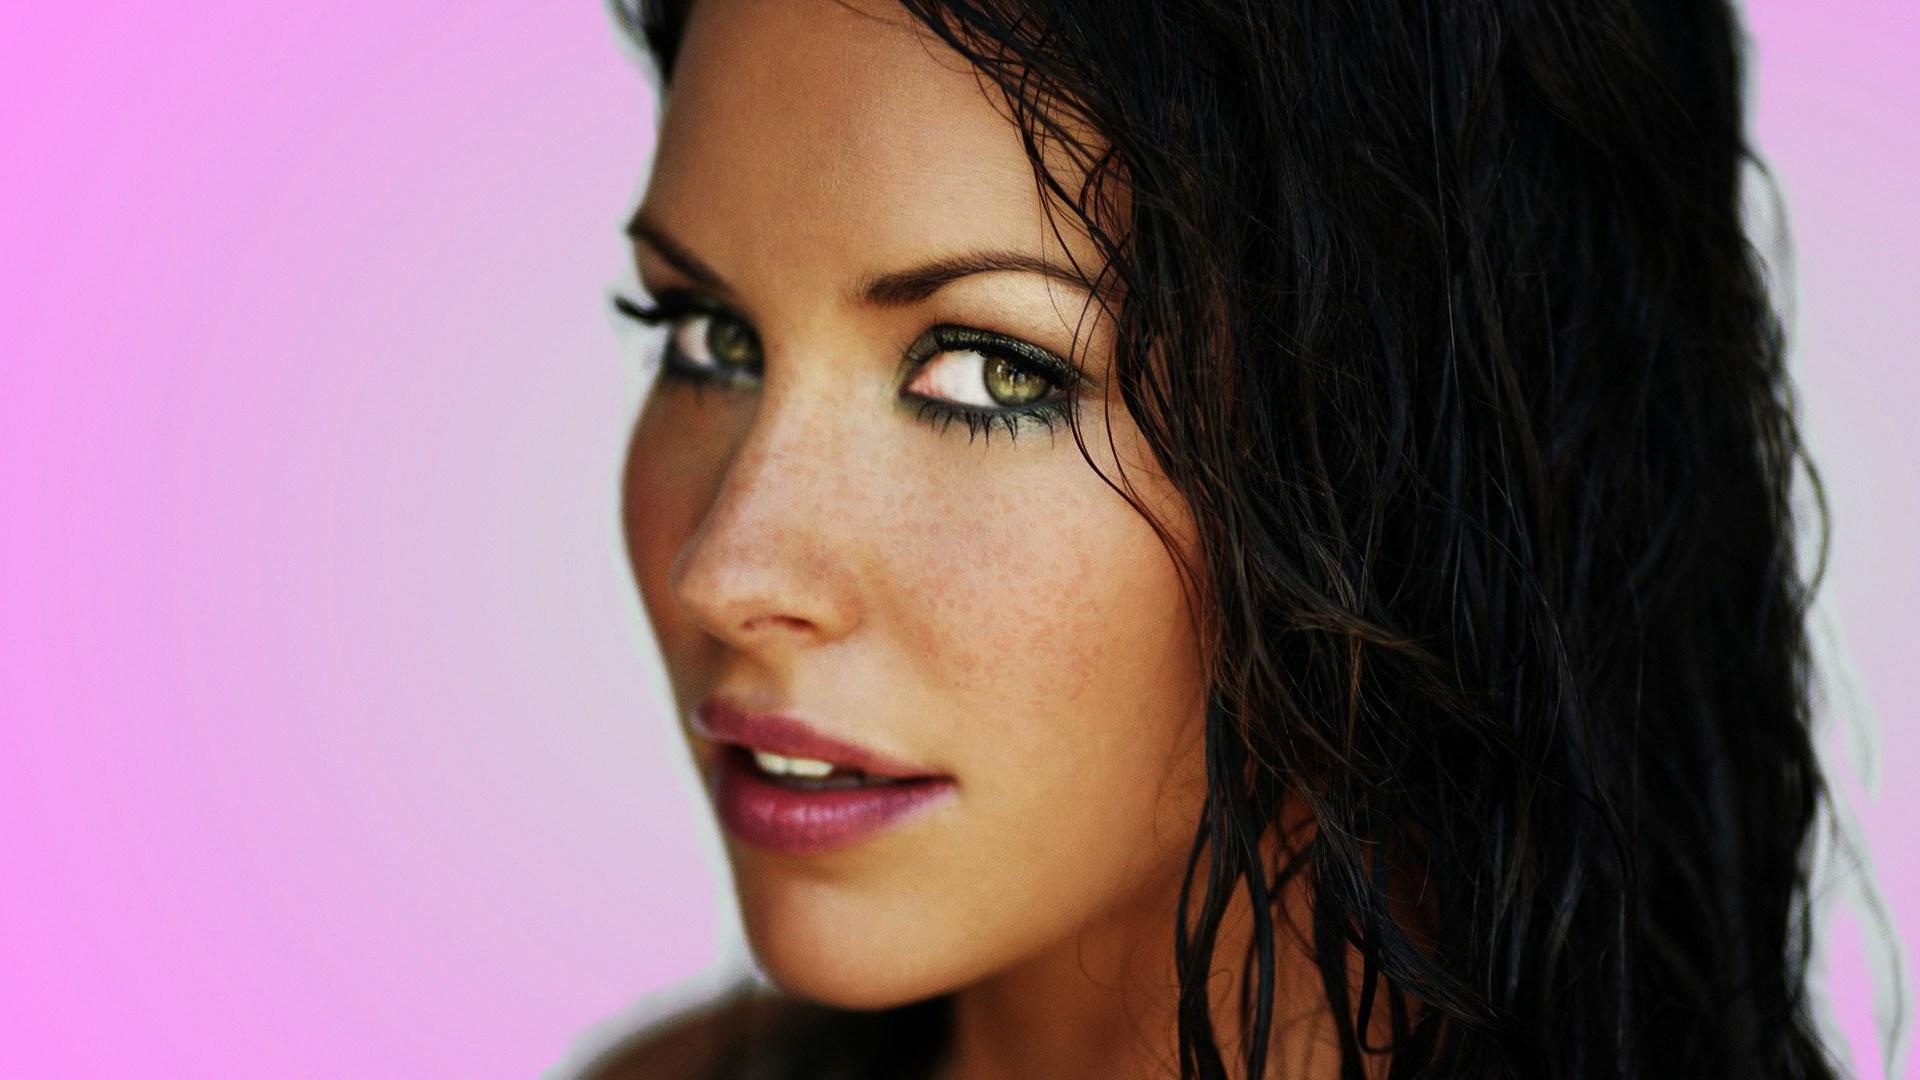 Evangeline Lilly Actress Girl Portrait